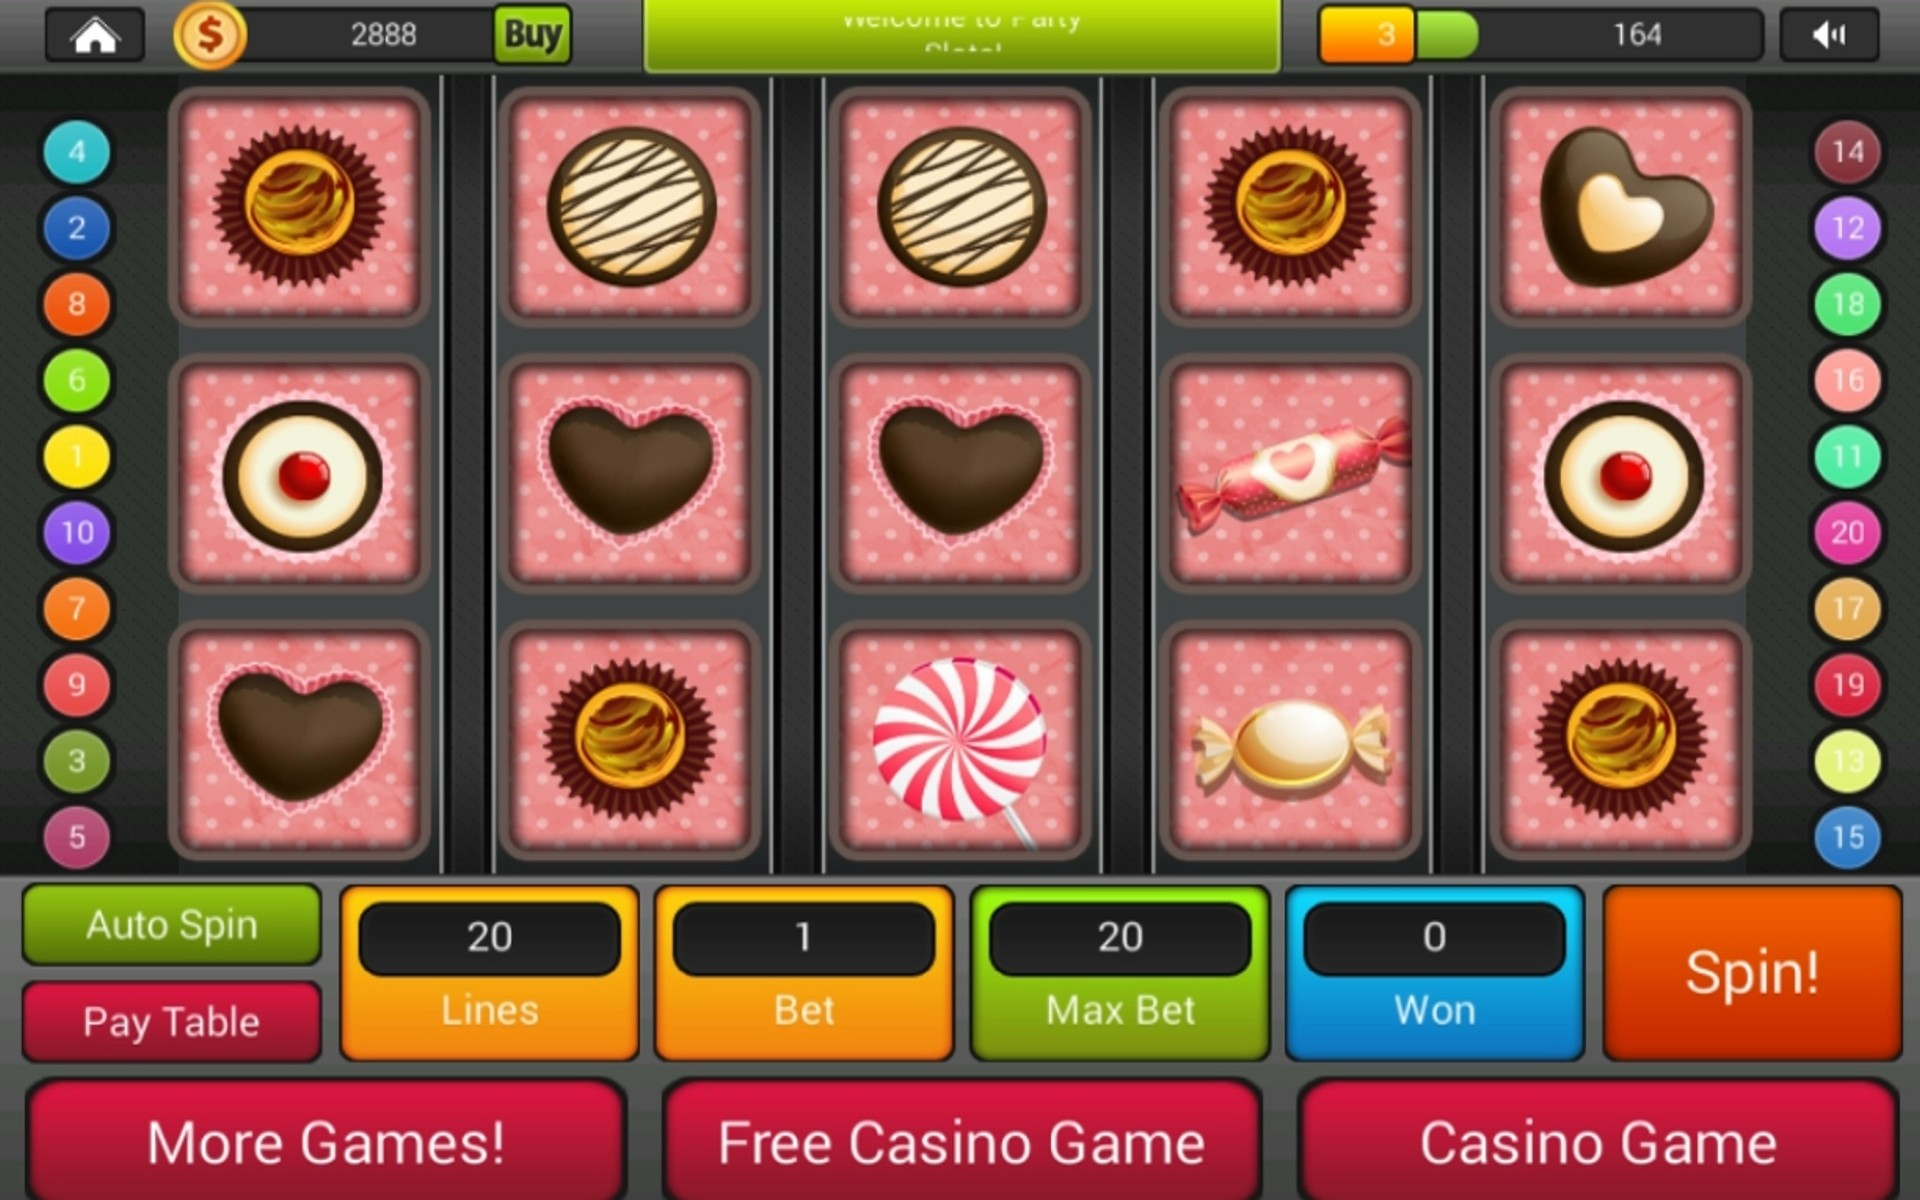 Jackpot slots trick